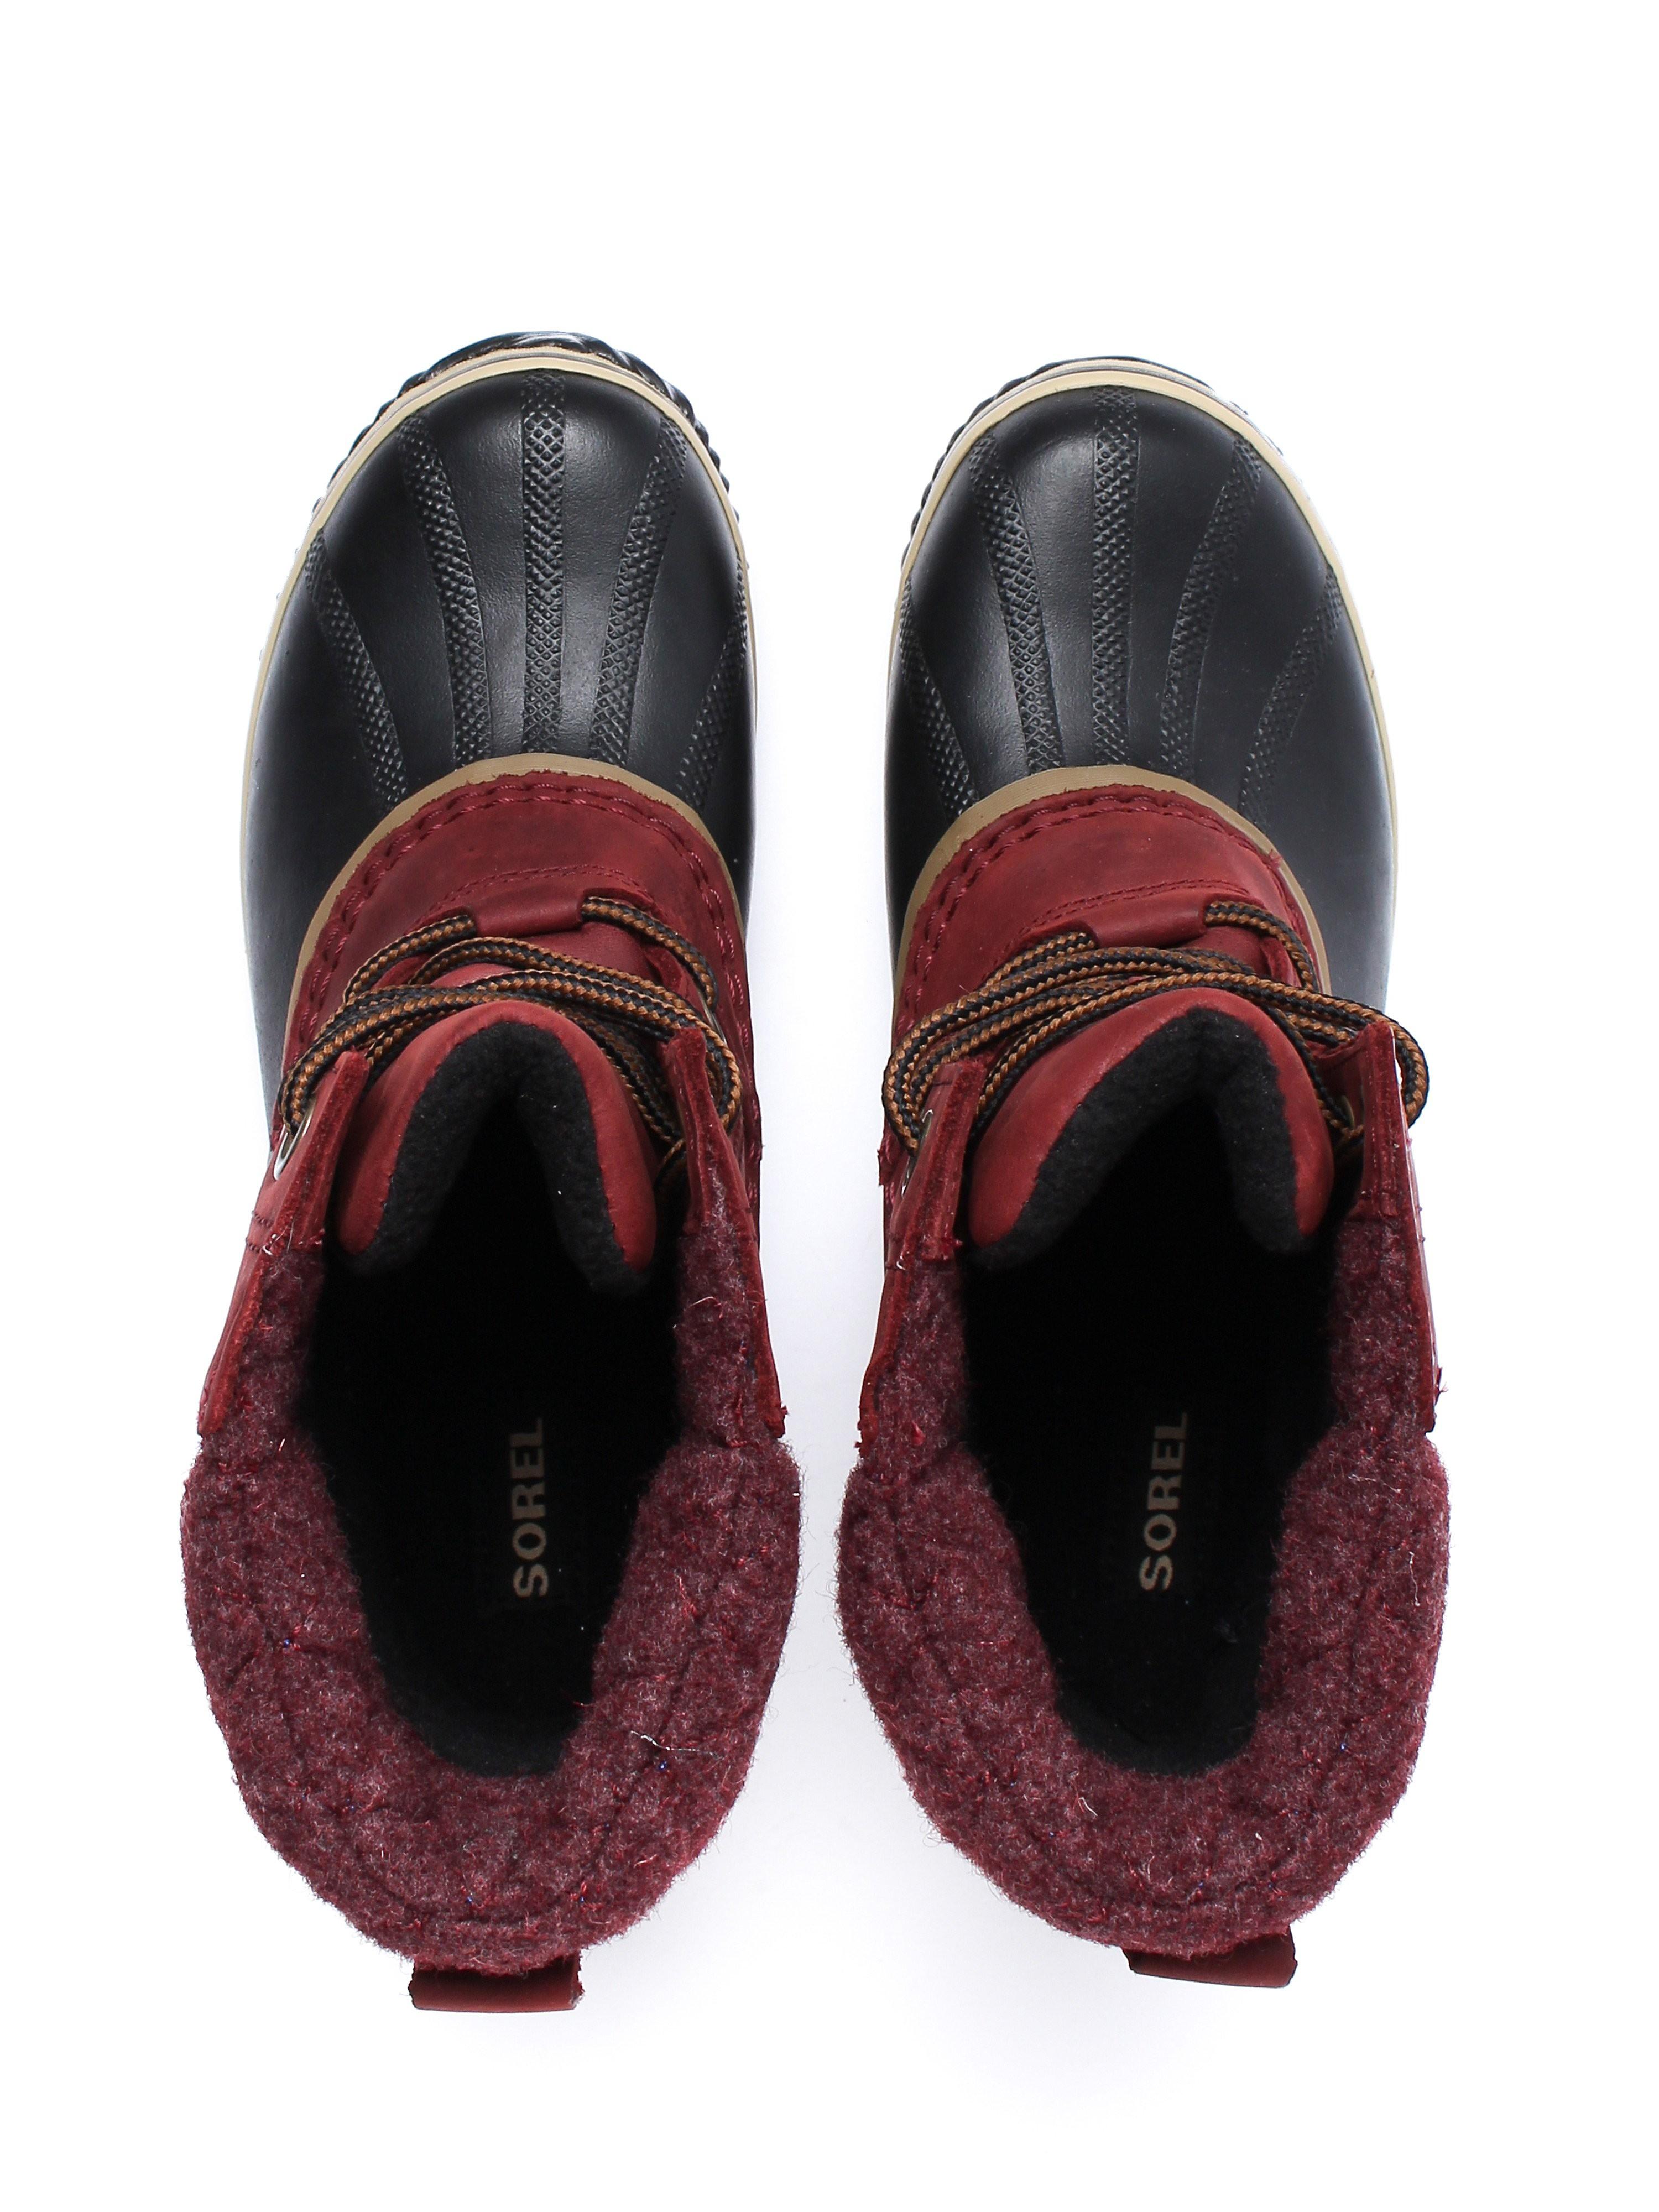 Sorel Women's Slimpack II Lace Boots - Redwood Tan